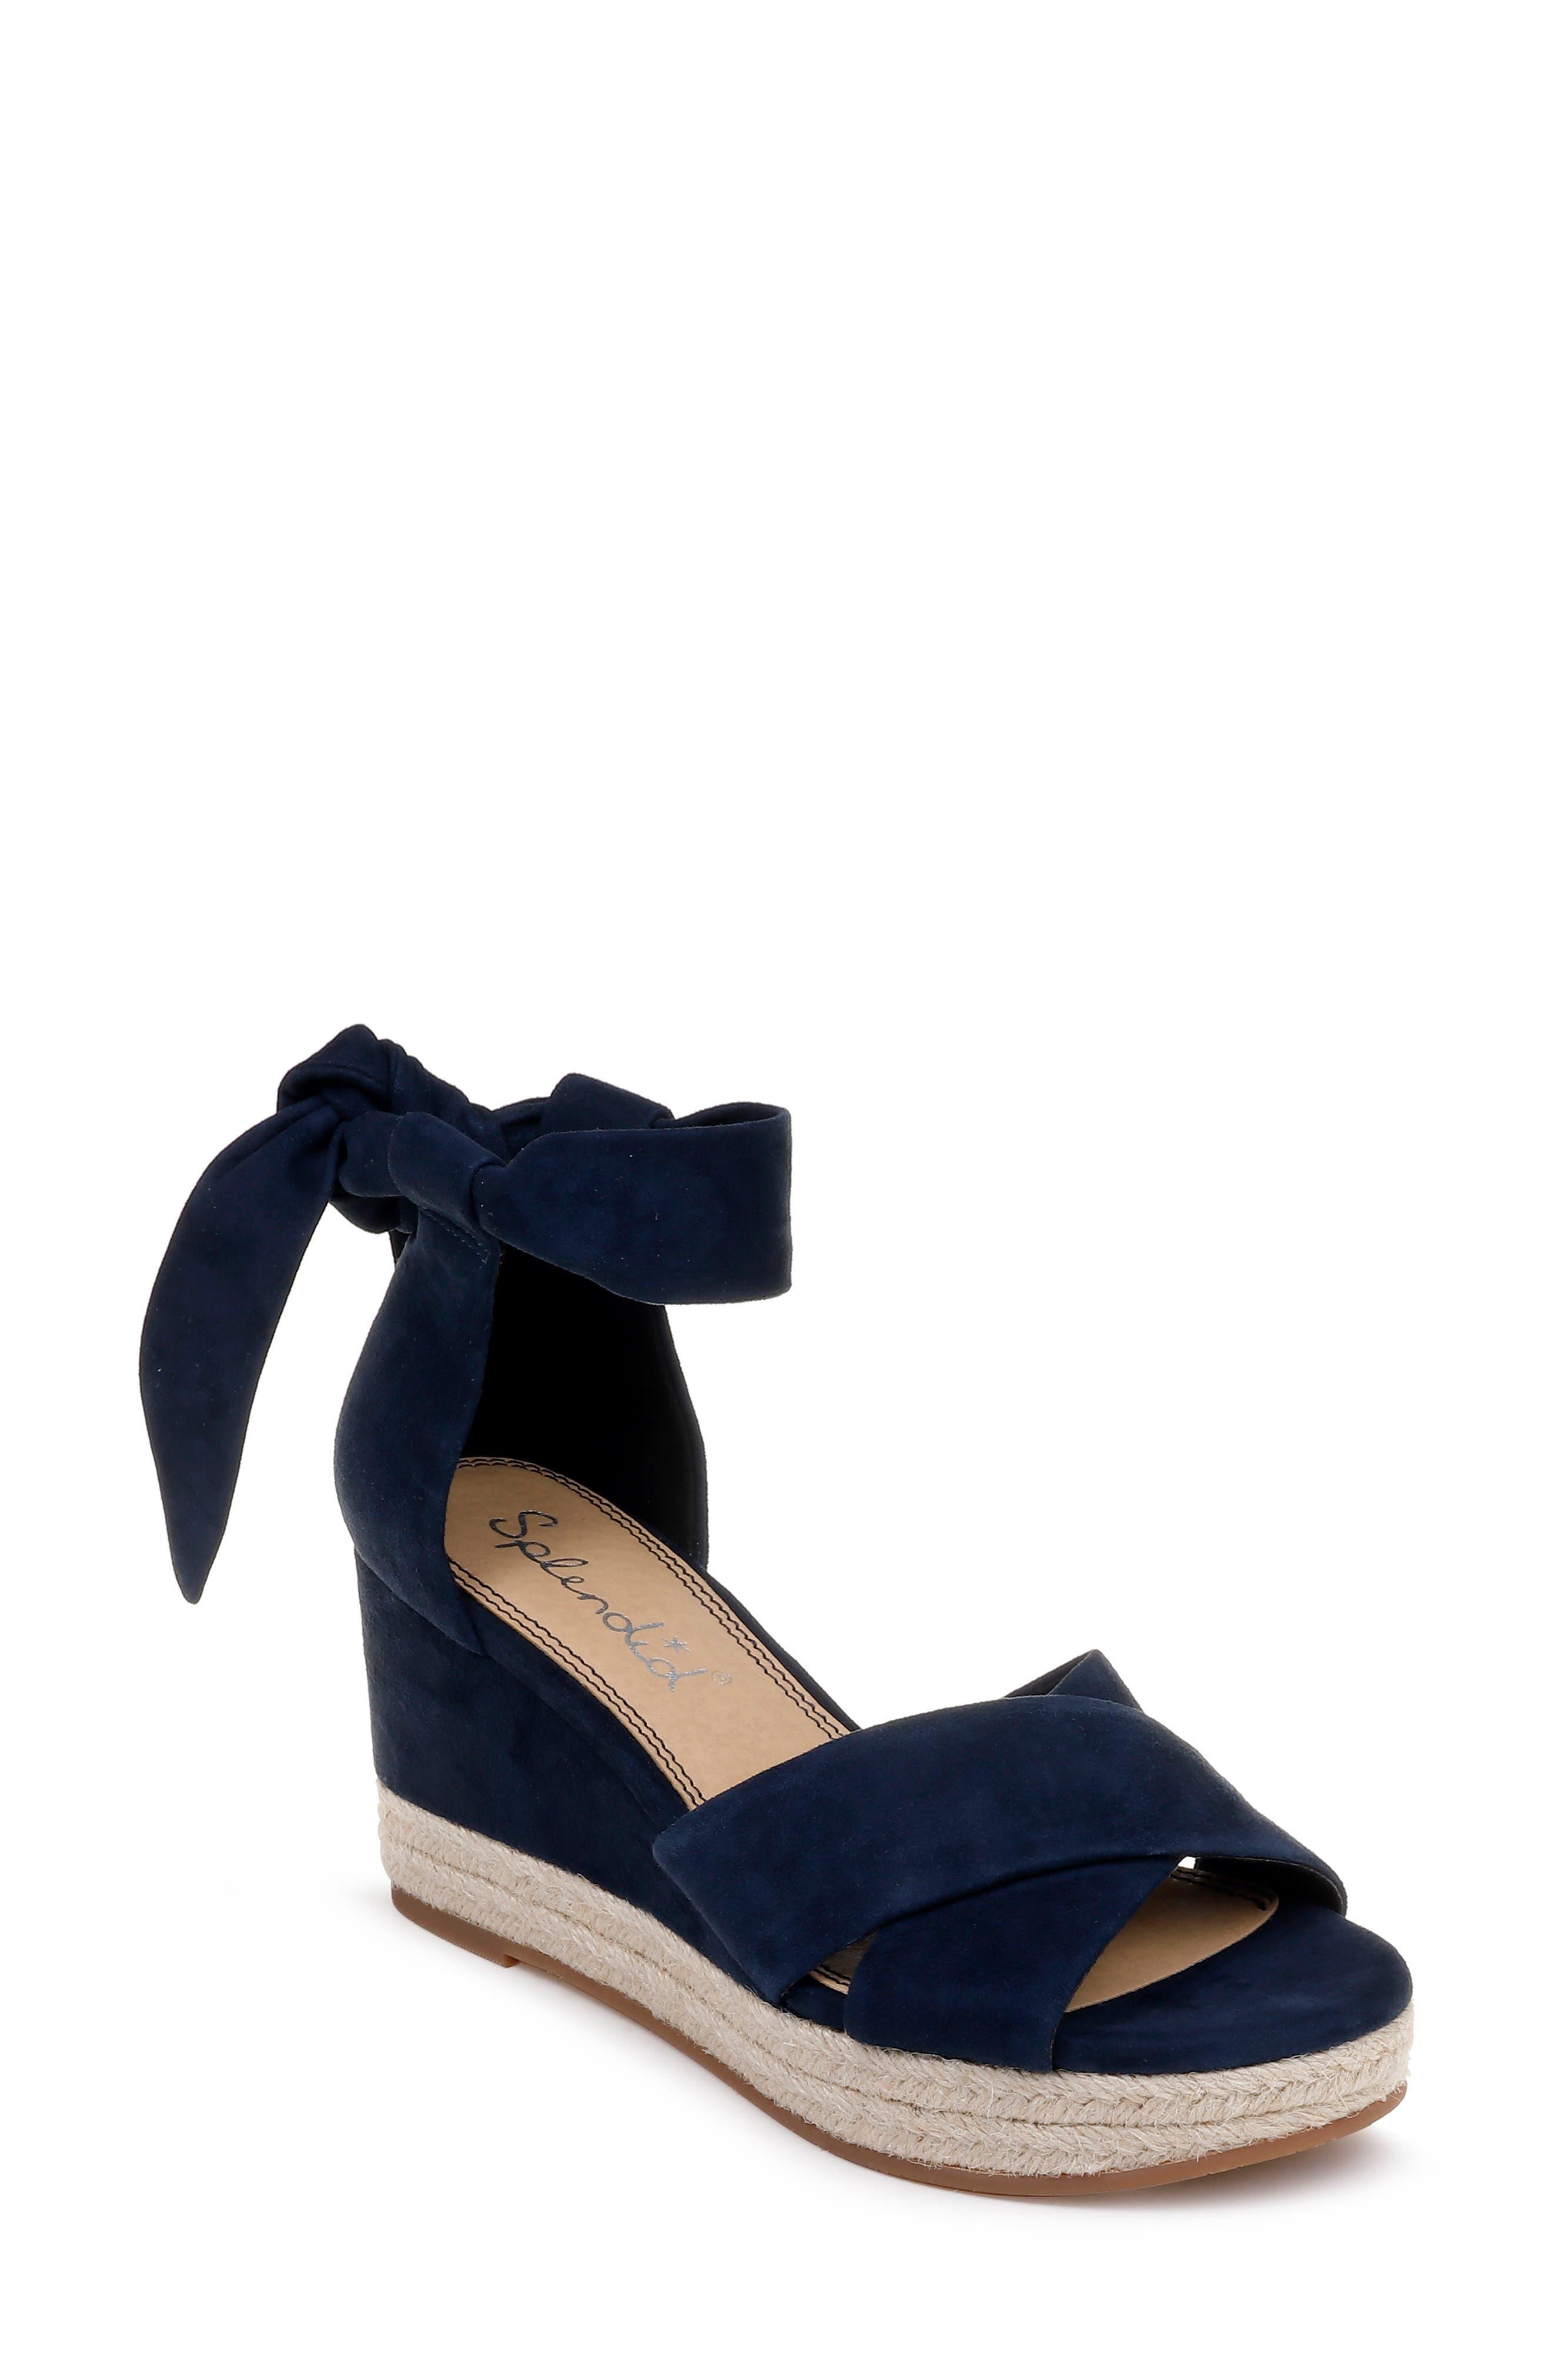 Splendid Terrence Ankle Wrap Wedge Sandal- Blue